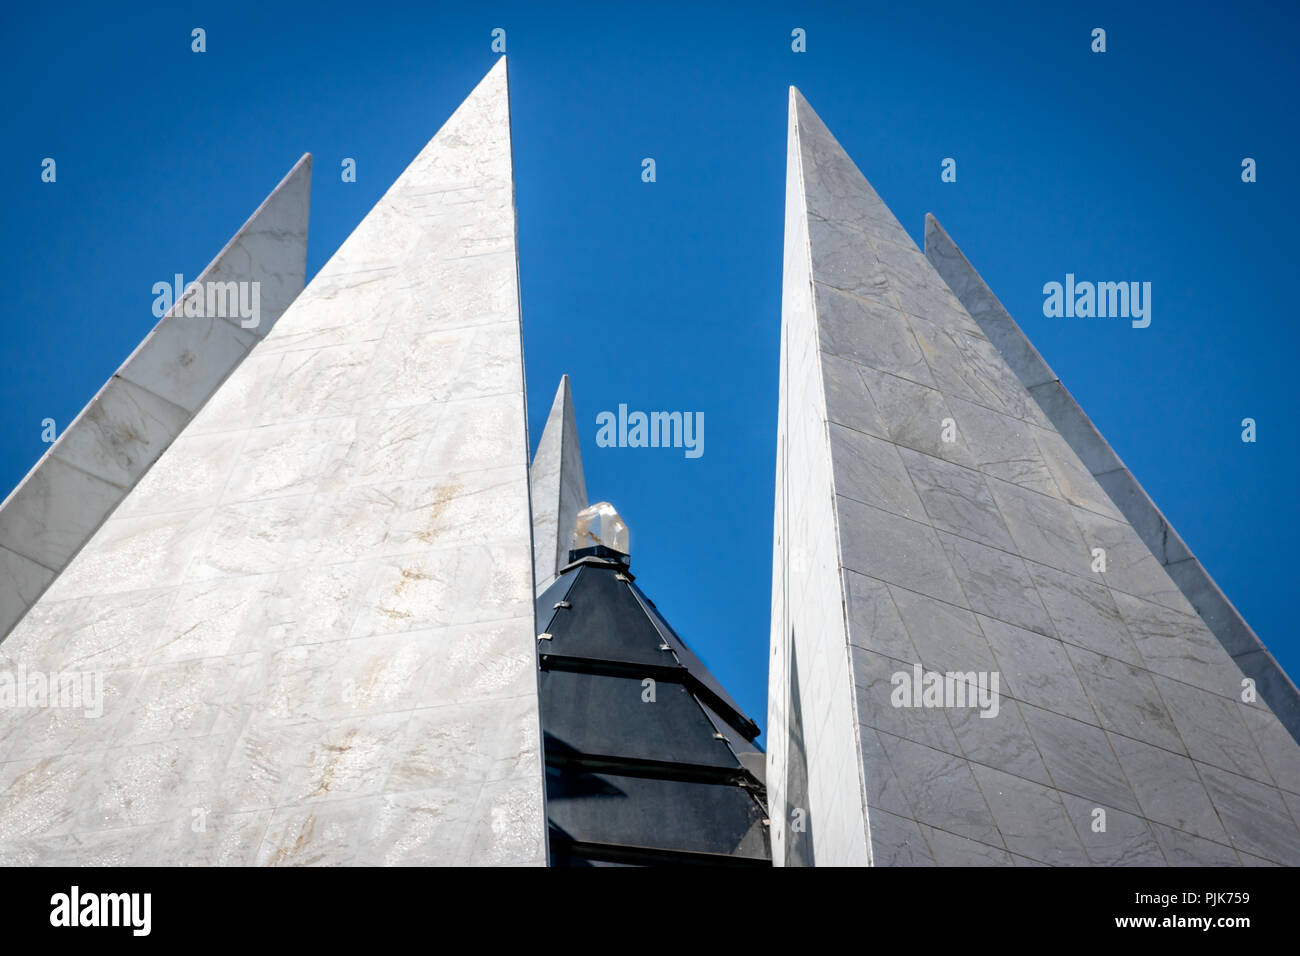 Crystal on top of Temple of Good Will (Templo da Boa Vontade) - Brasilia, Distrito Federal, Brazil - Stock Image